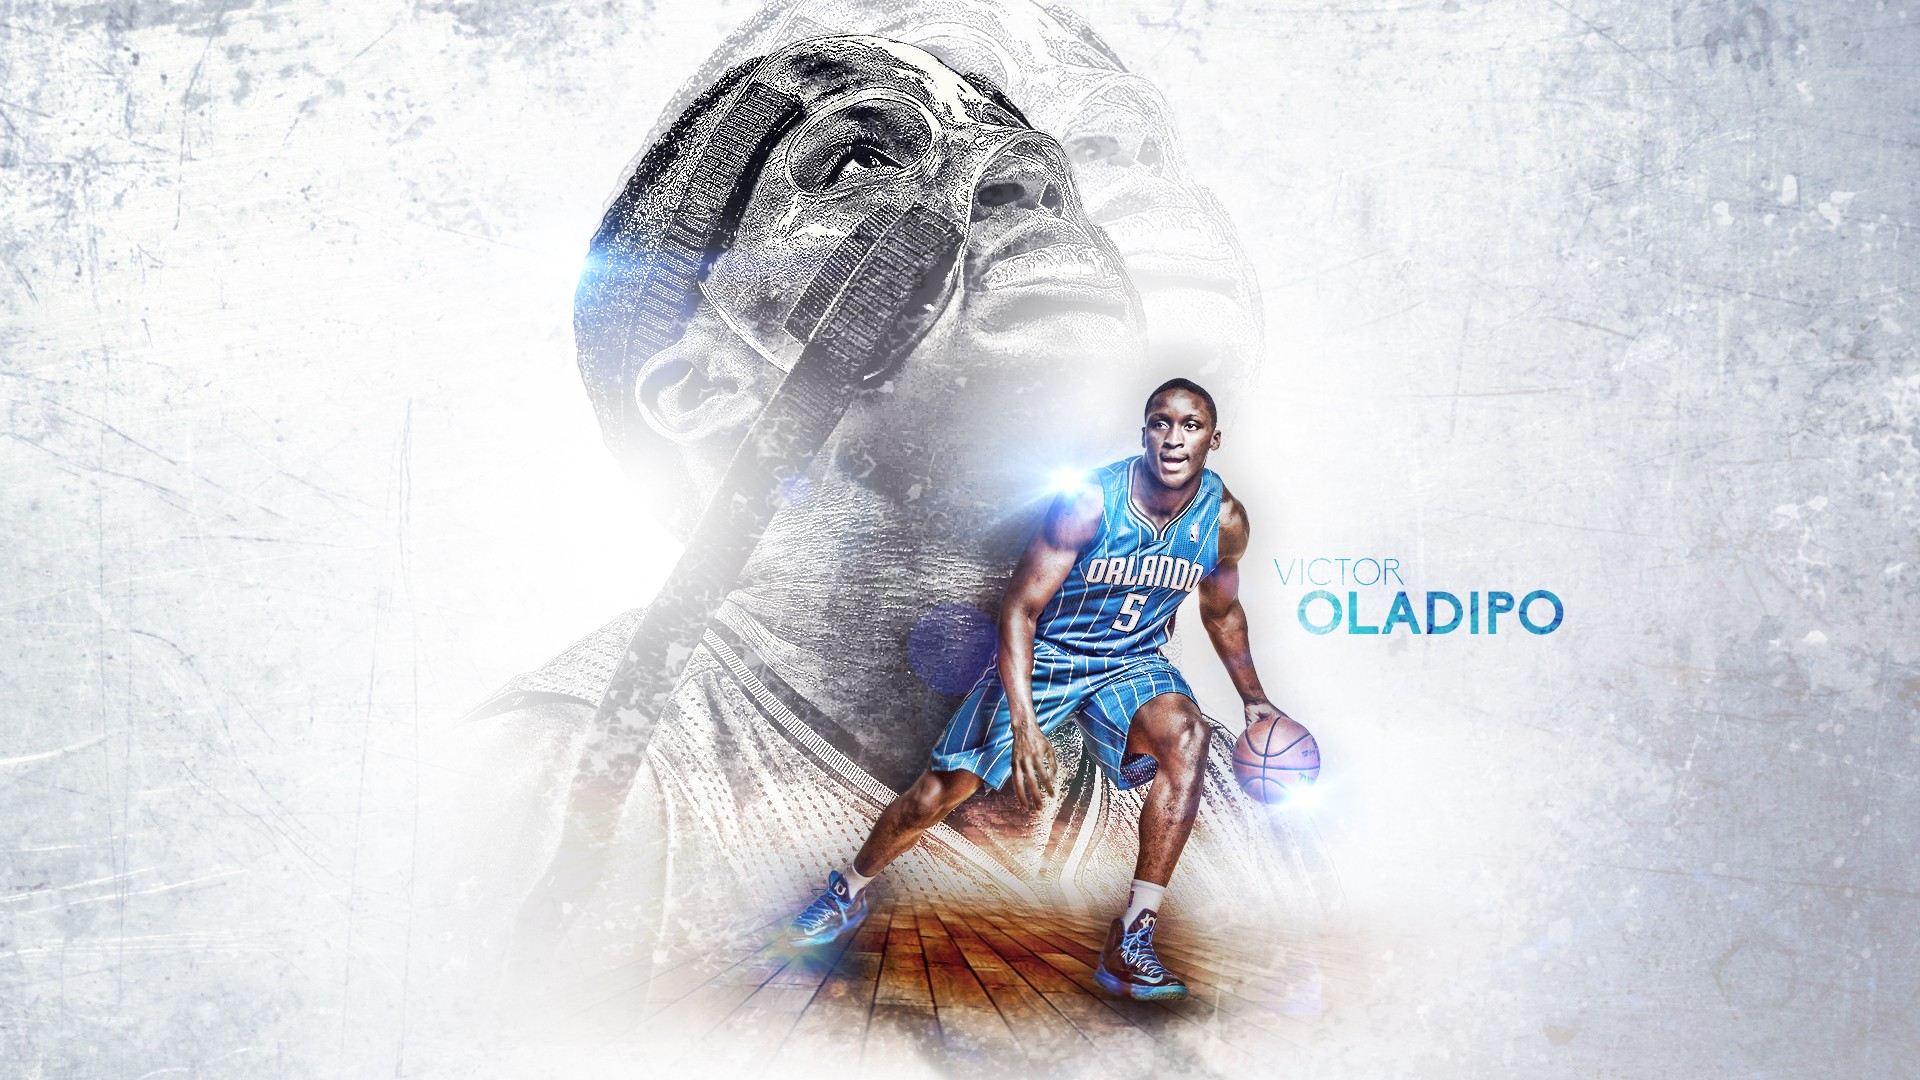 sports Basketball Victor Oladipo Magic Wallpapers HD 1920x1080